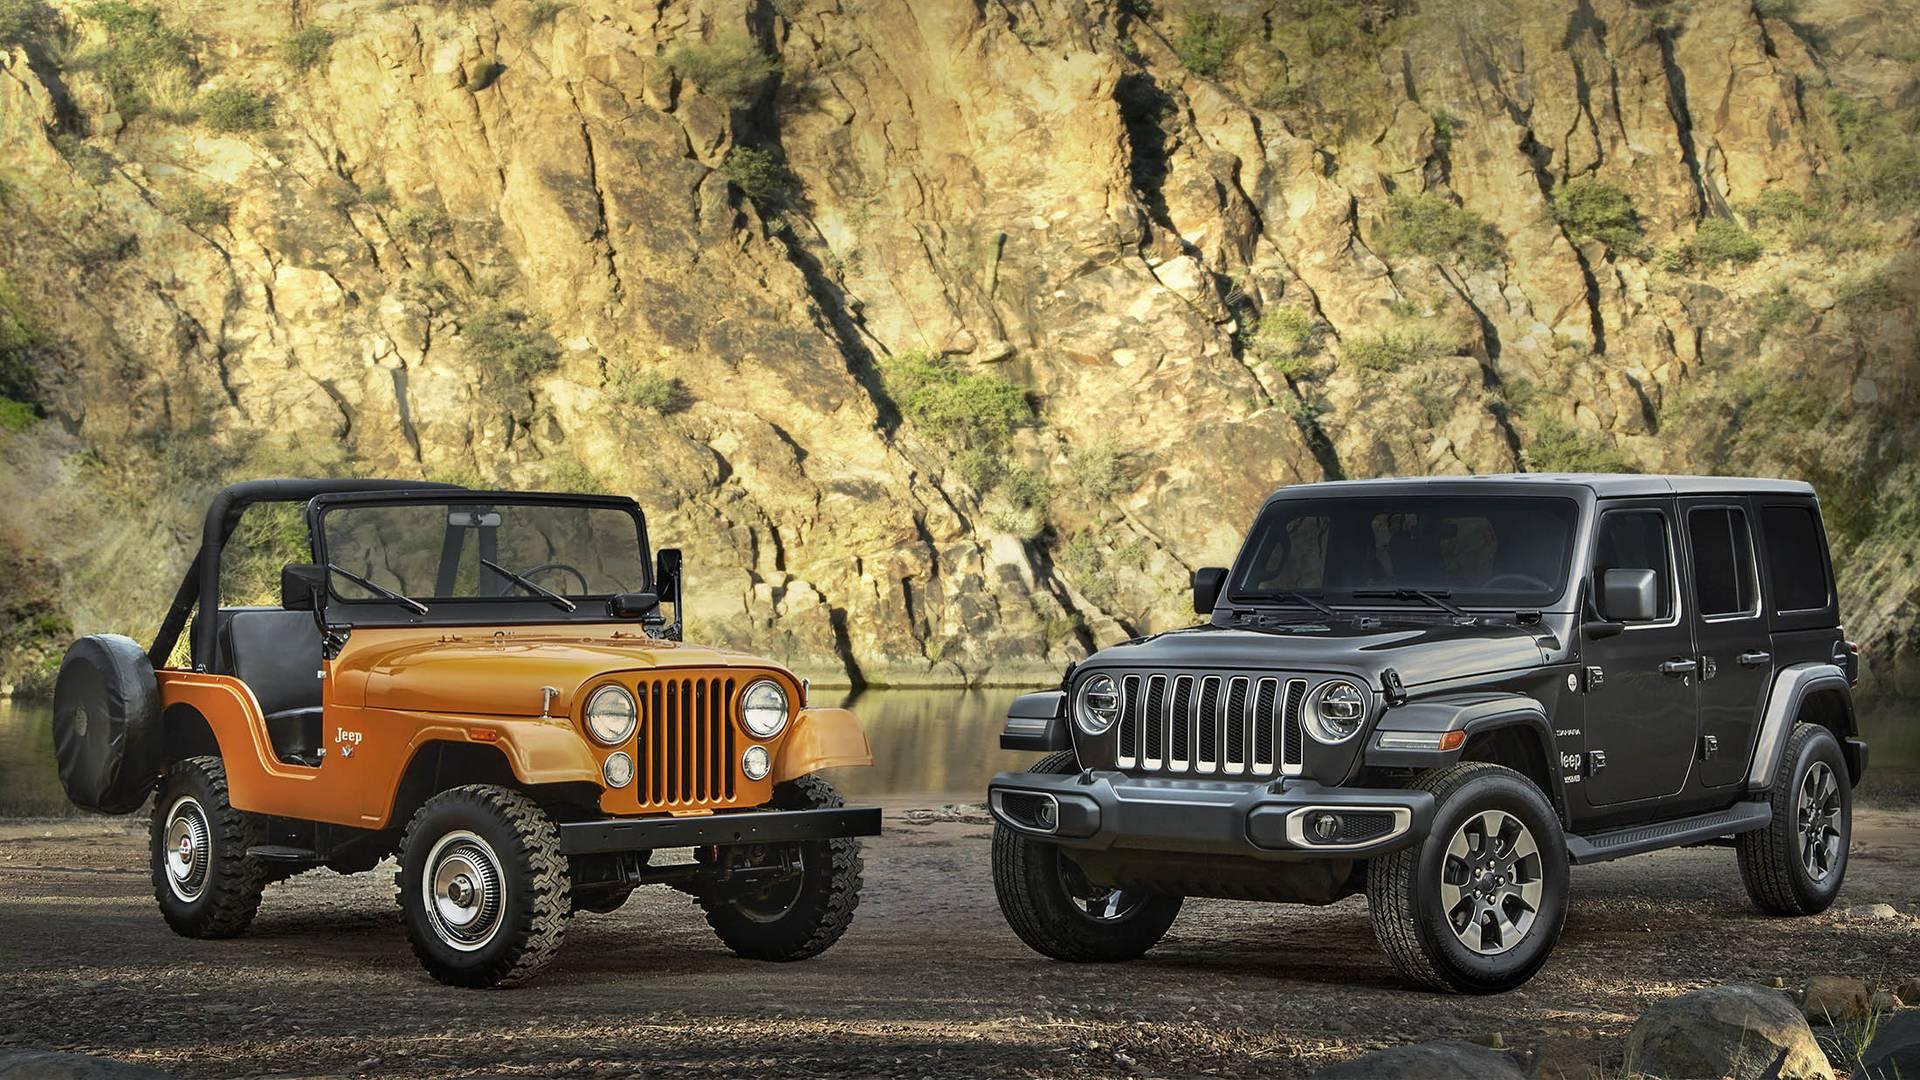 1973 Jeep® CJ-5 and all-new 2018 Jeep Wrangler Sahara